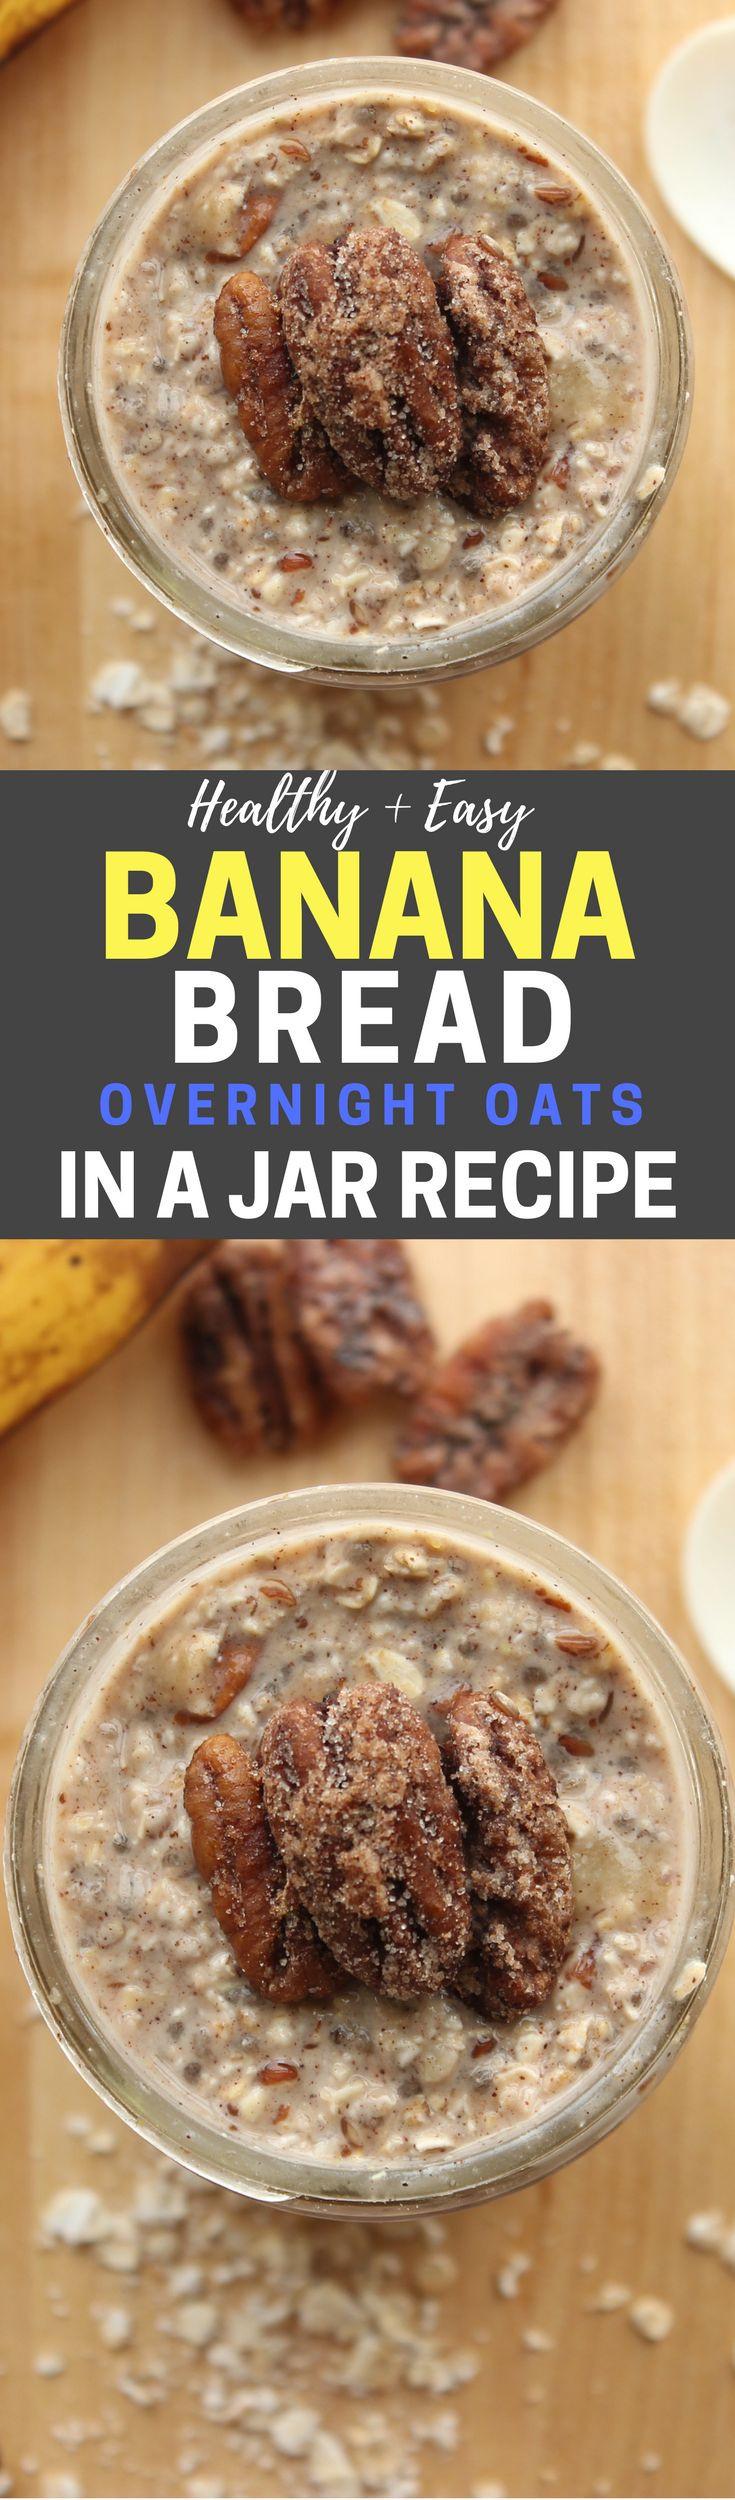 Easy Banana Recipes Healthy  Best 25 Healthy breakfasts ideas on Pinterest